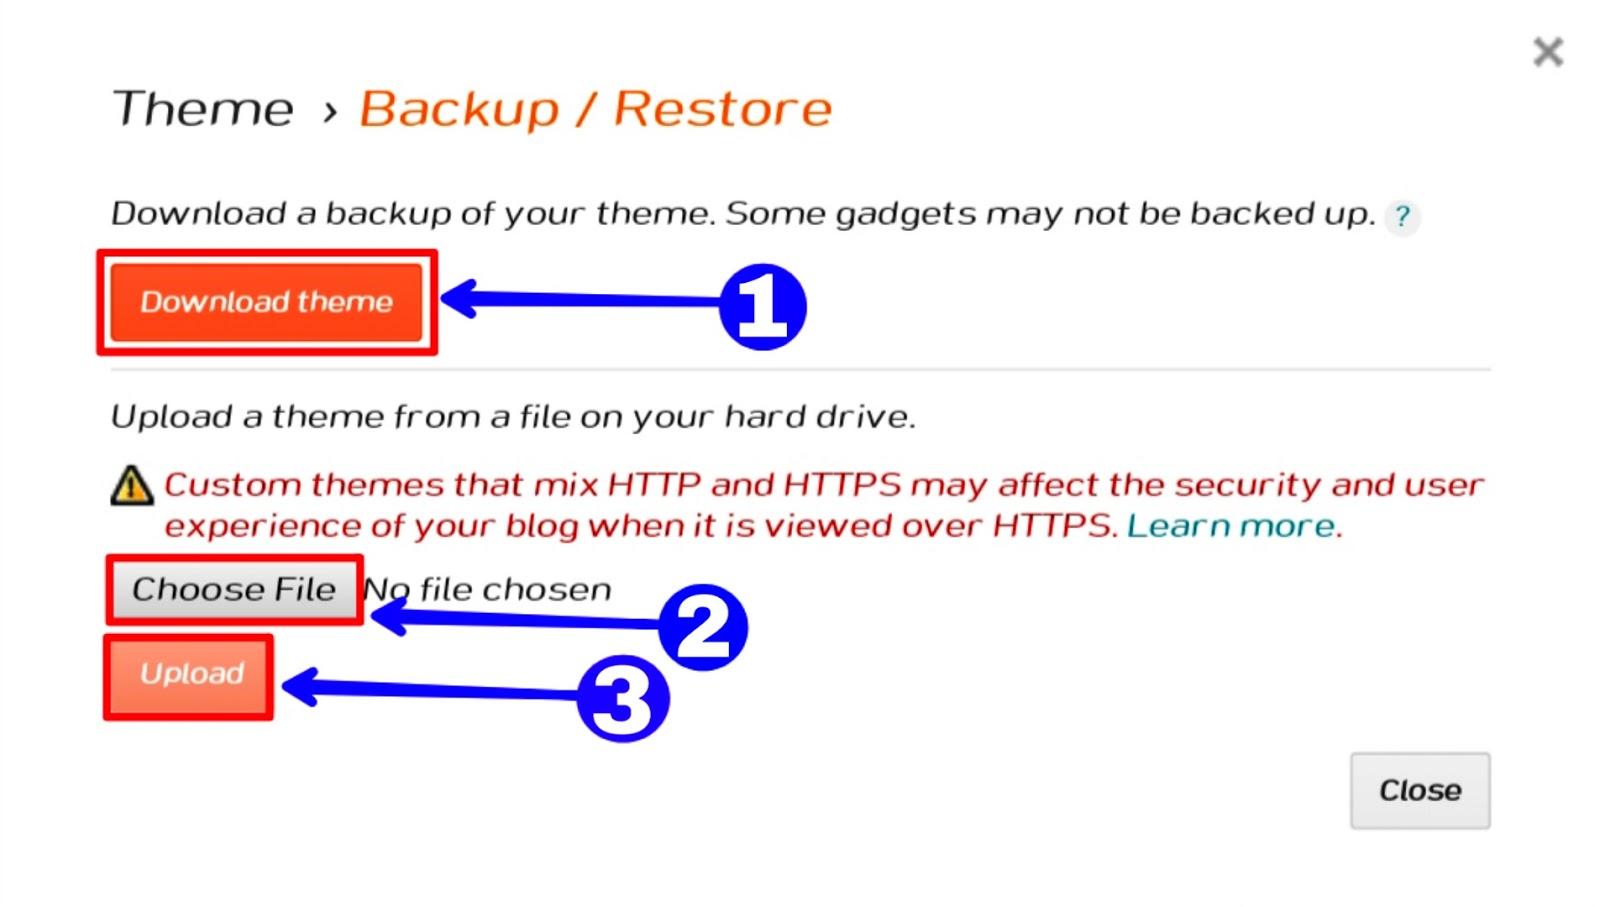 blogger me template change kasie kare